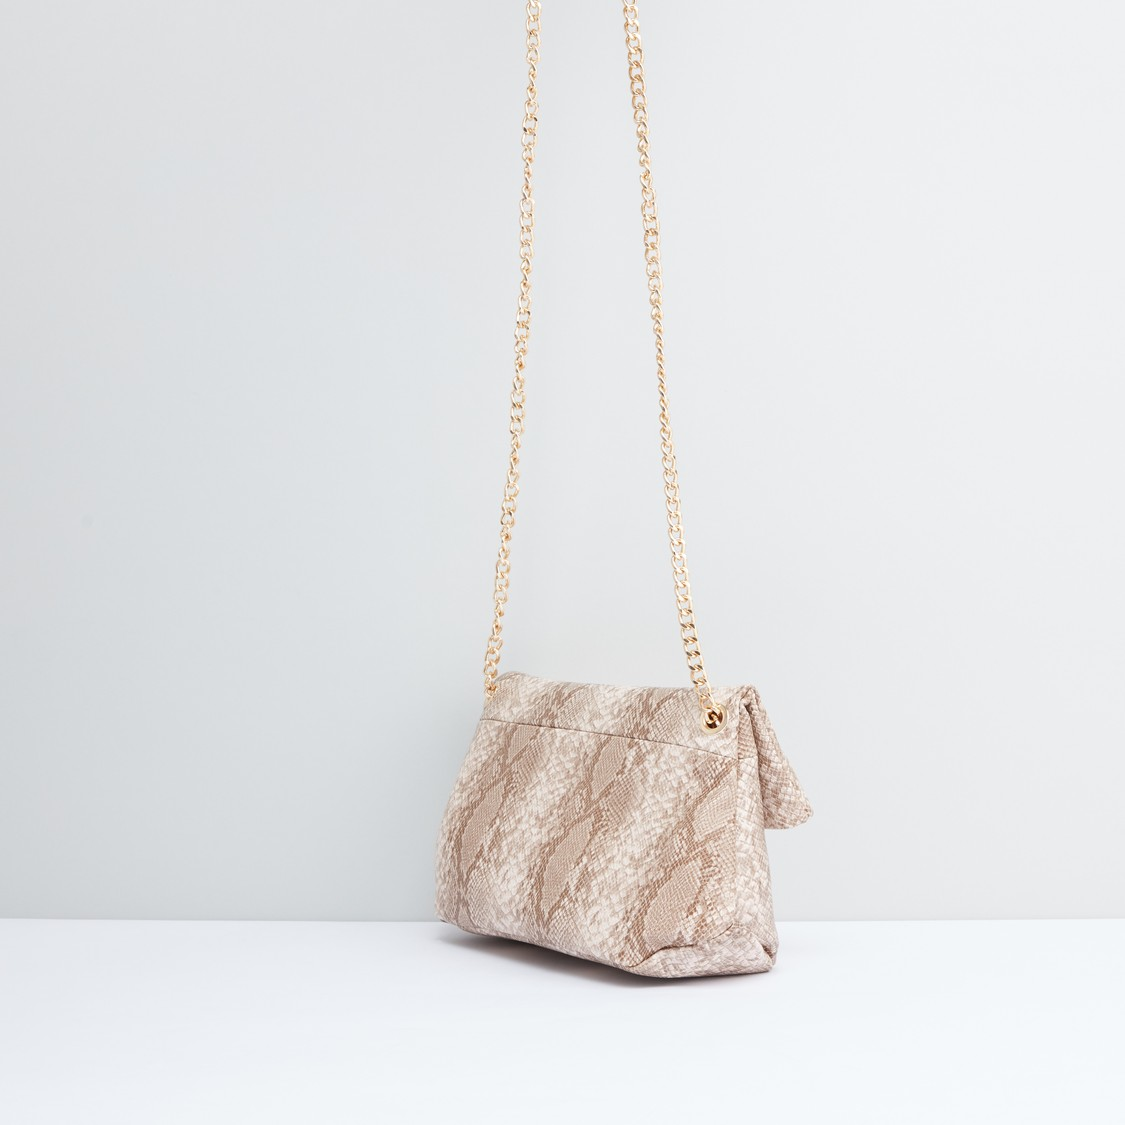 Animal Printed Crossbody Bag with Metallic Chain